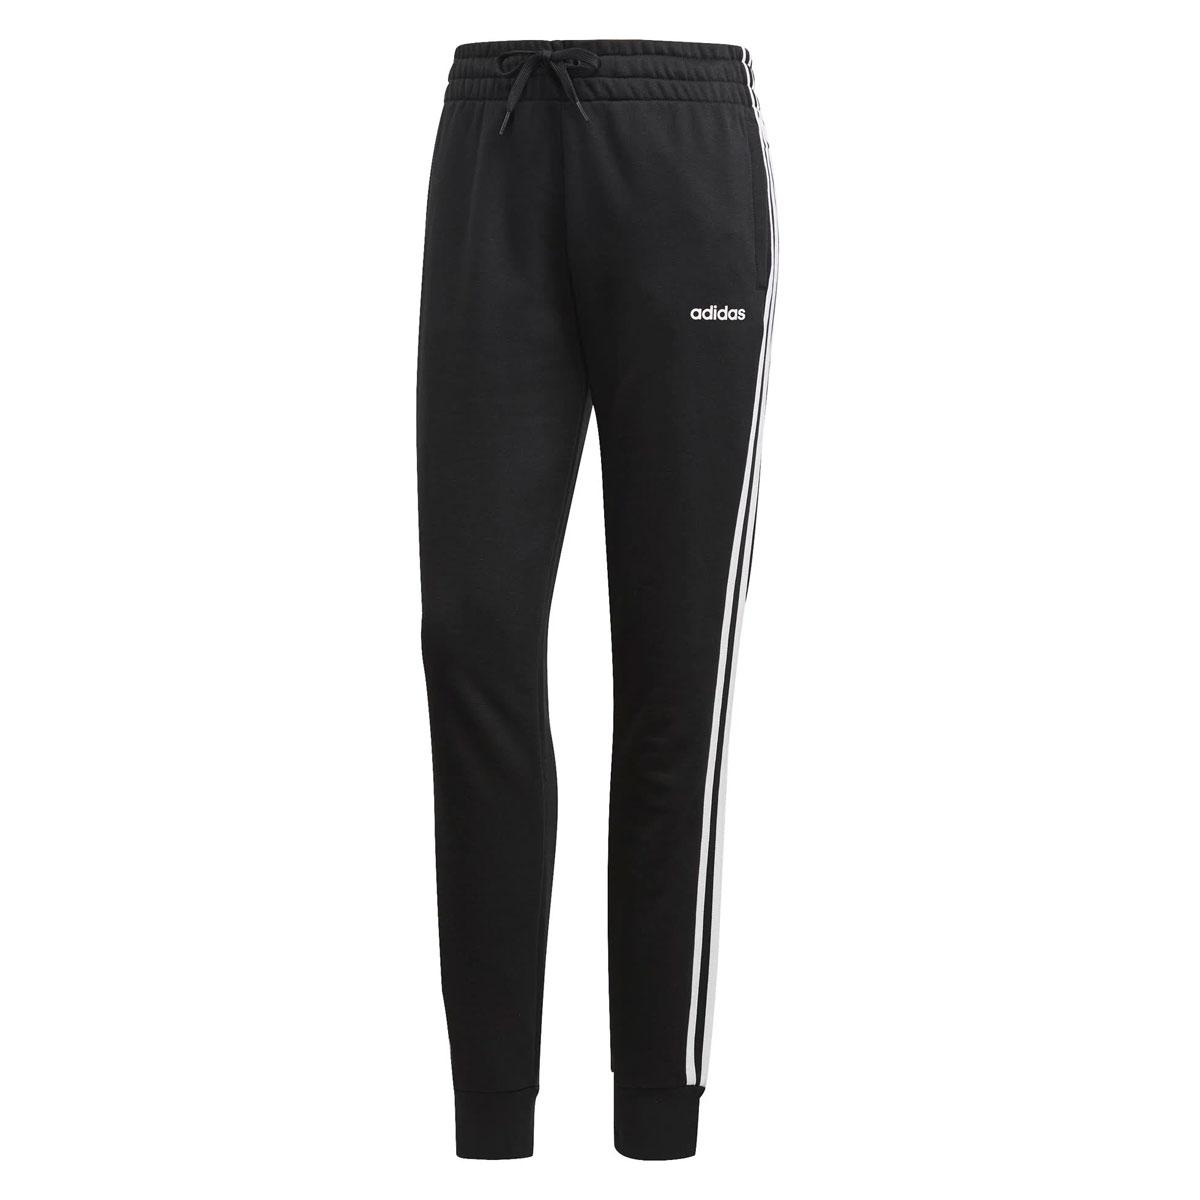 Adidas Essentials 3 stripes Trainingsbroek